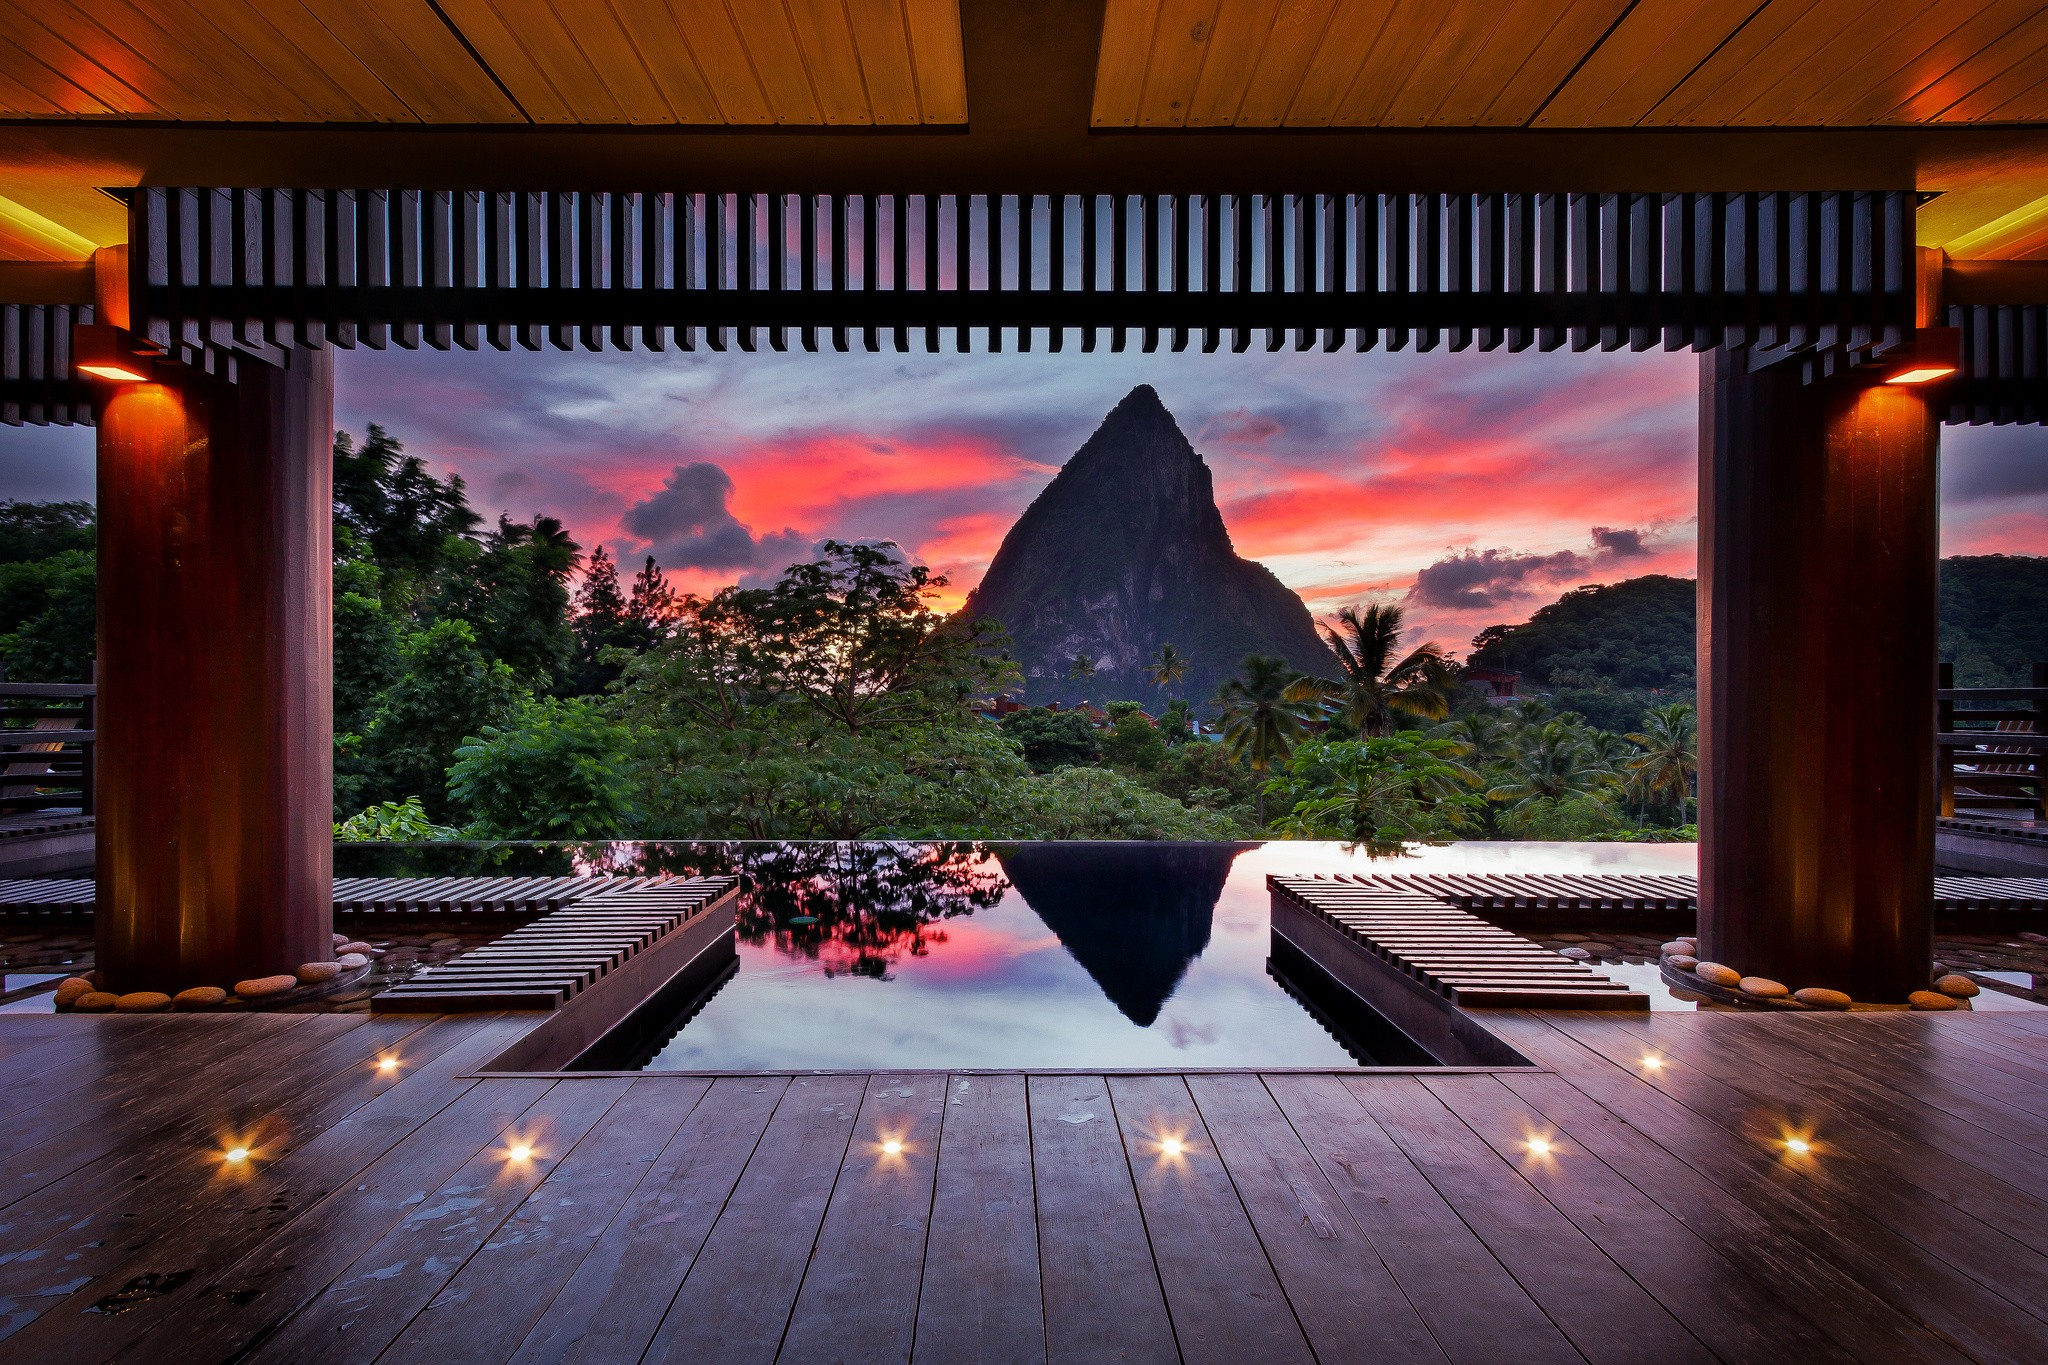 wallpaper sunset architecture hotel